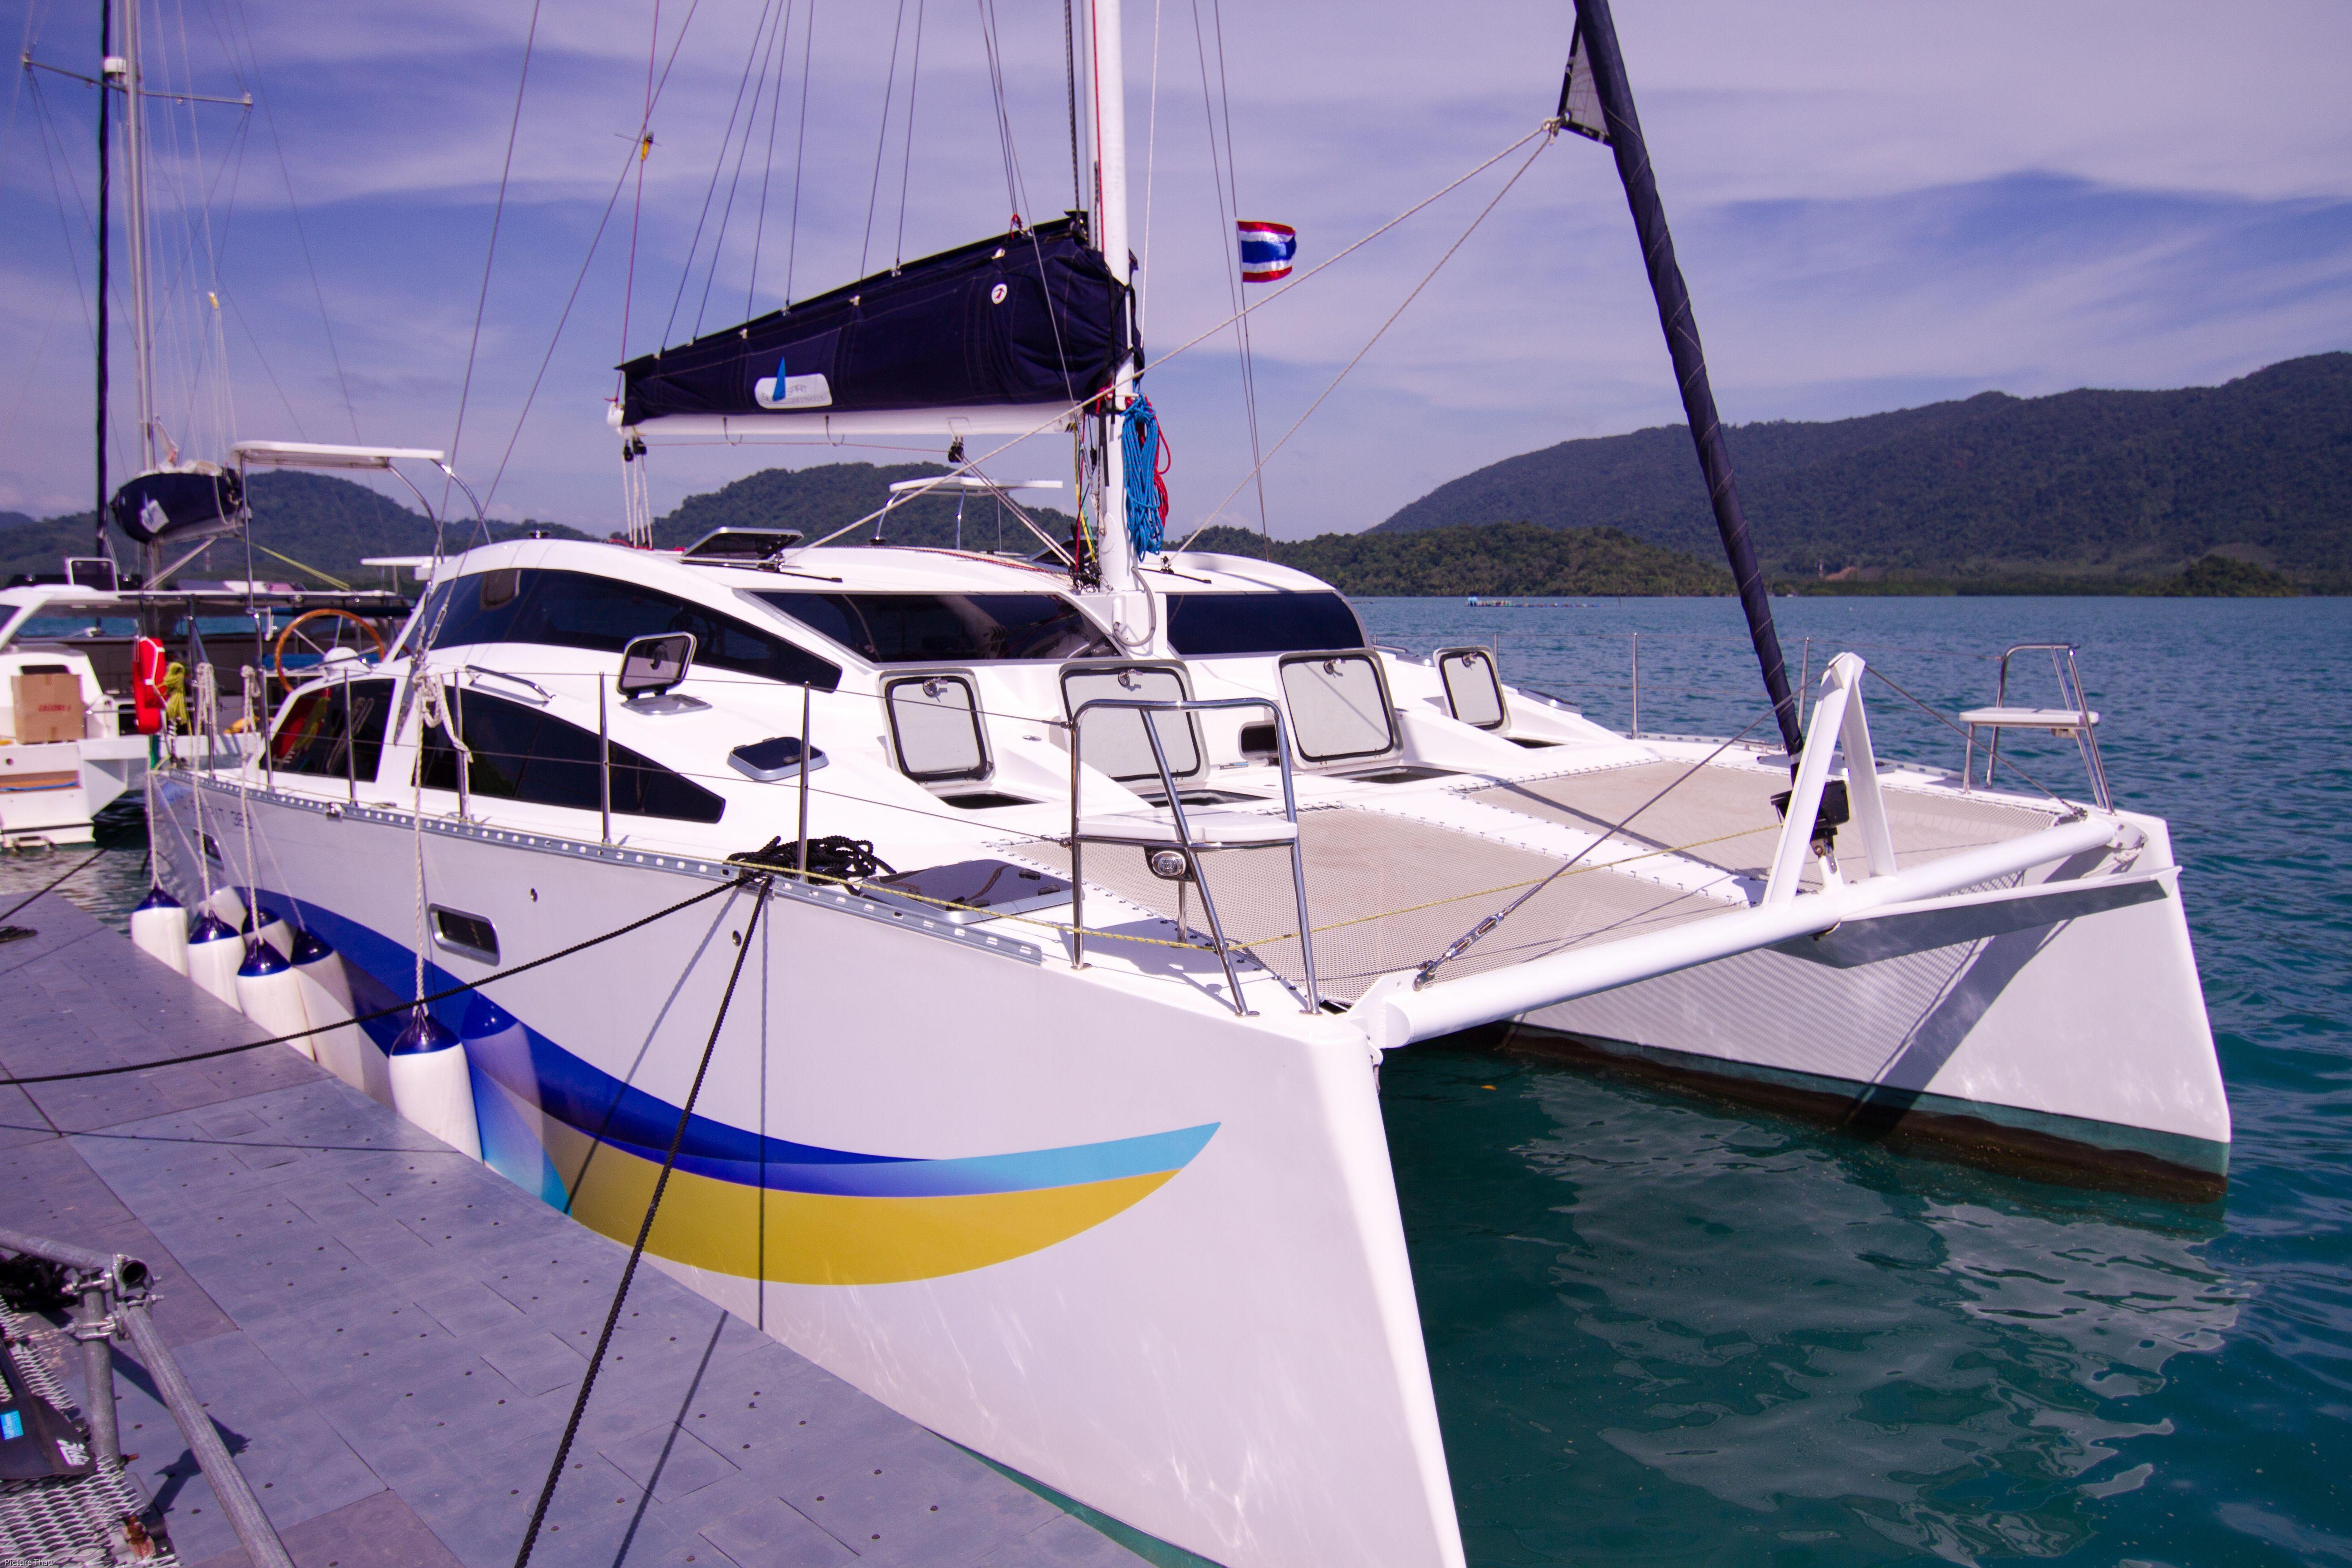 https://imageresizer.yachtsbt.com/boats/104500/5defbca7b598570d715cb370.jpeg